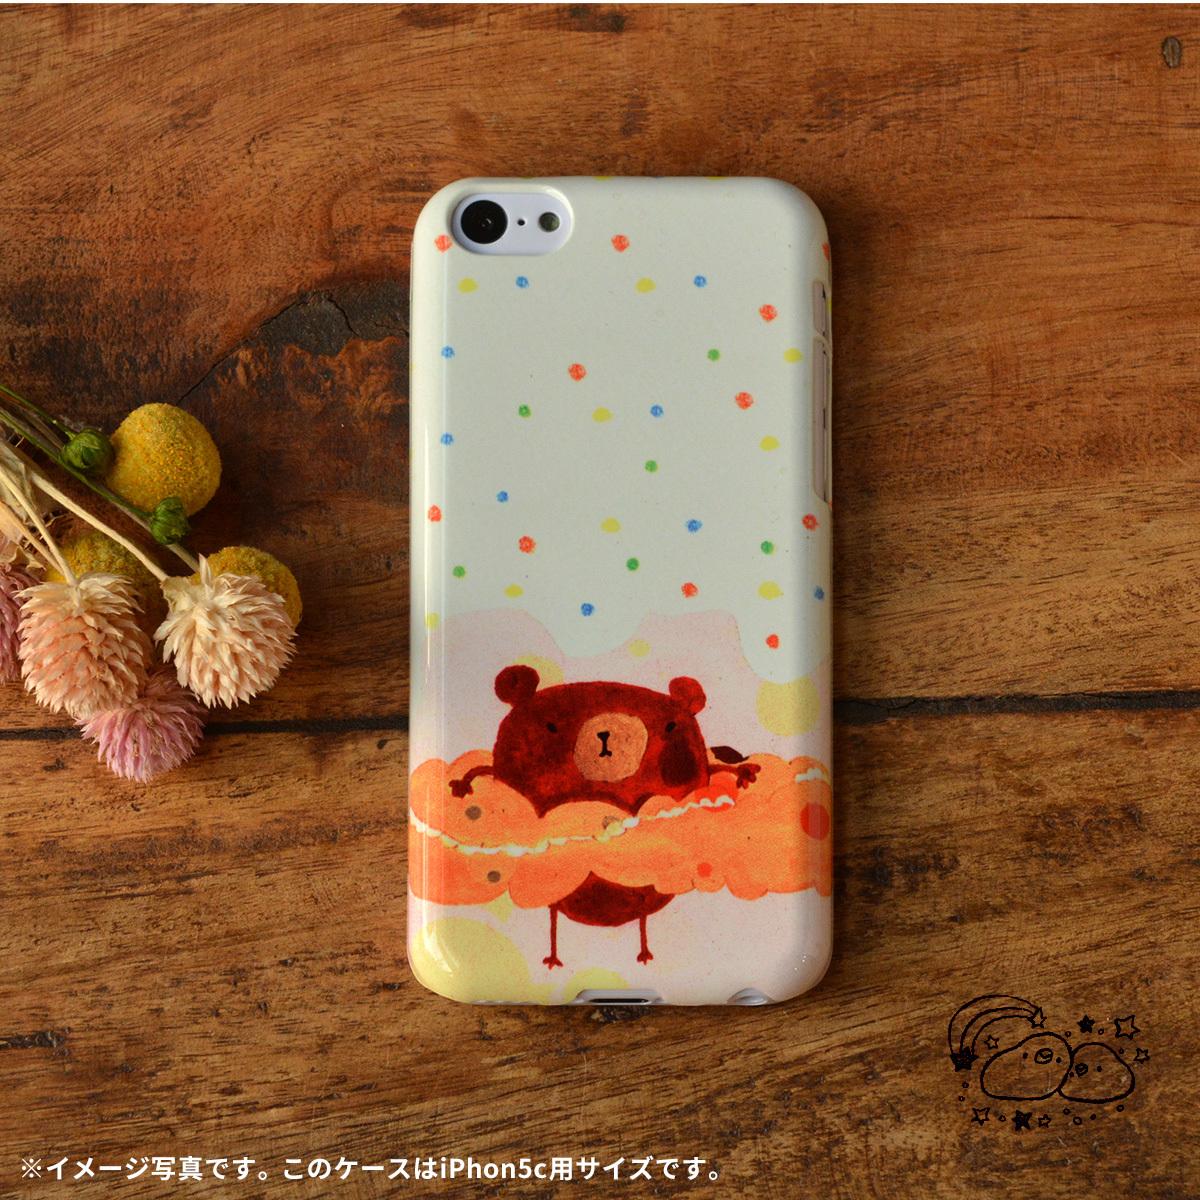 iphone5c ケース ドット iphone5c ドットケース iphone5c ケース 水玉 ぬん/chitch